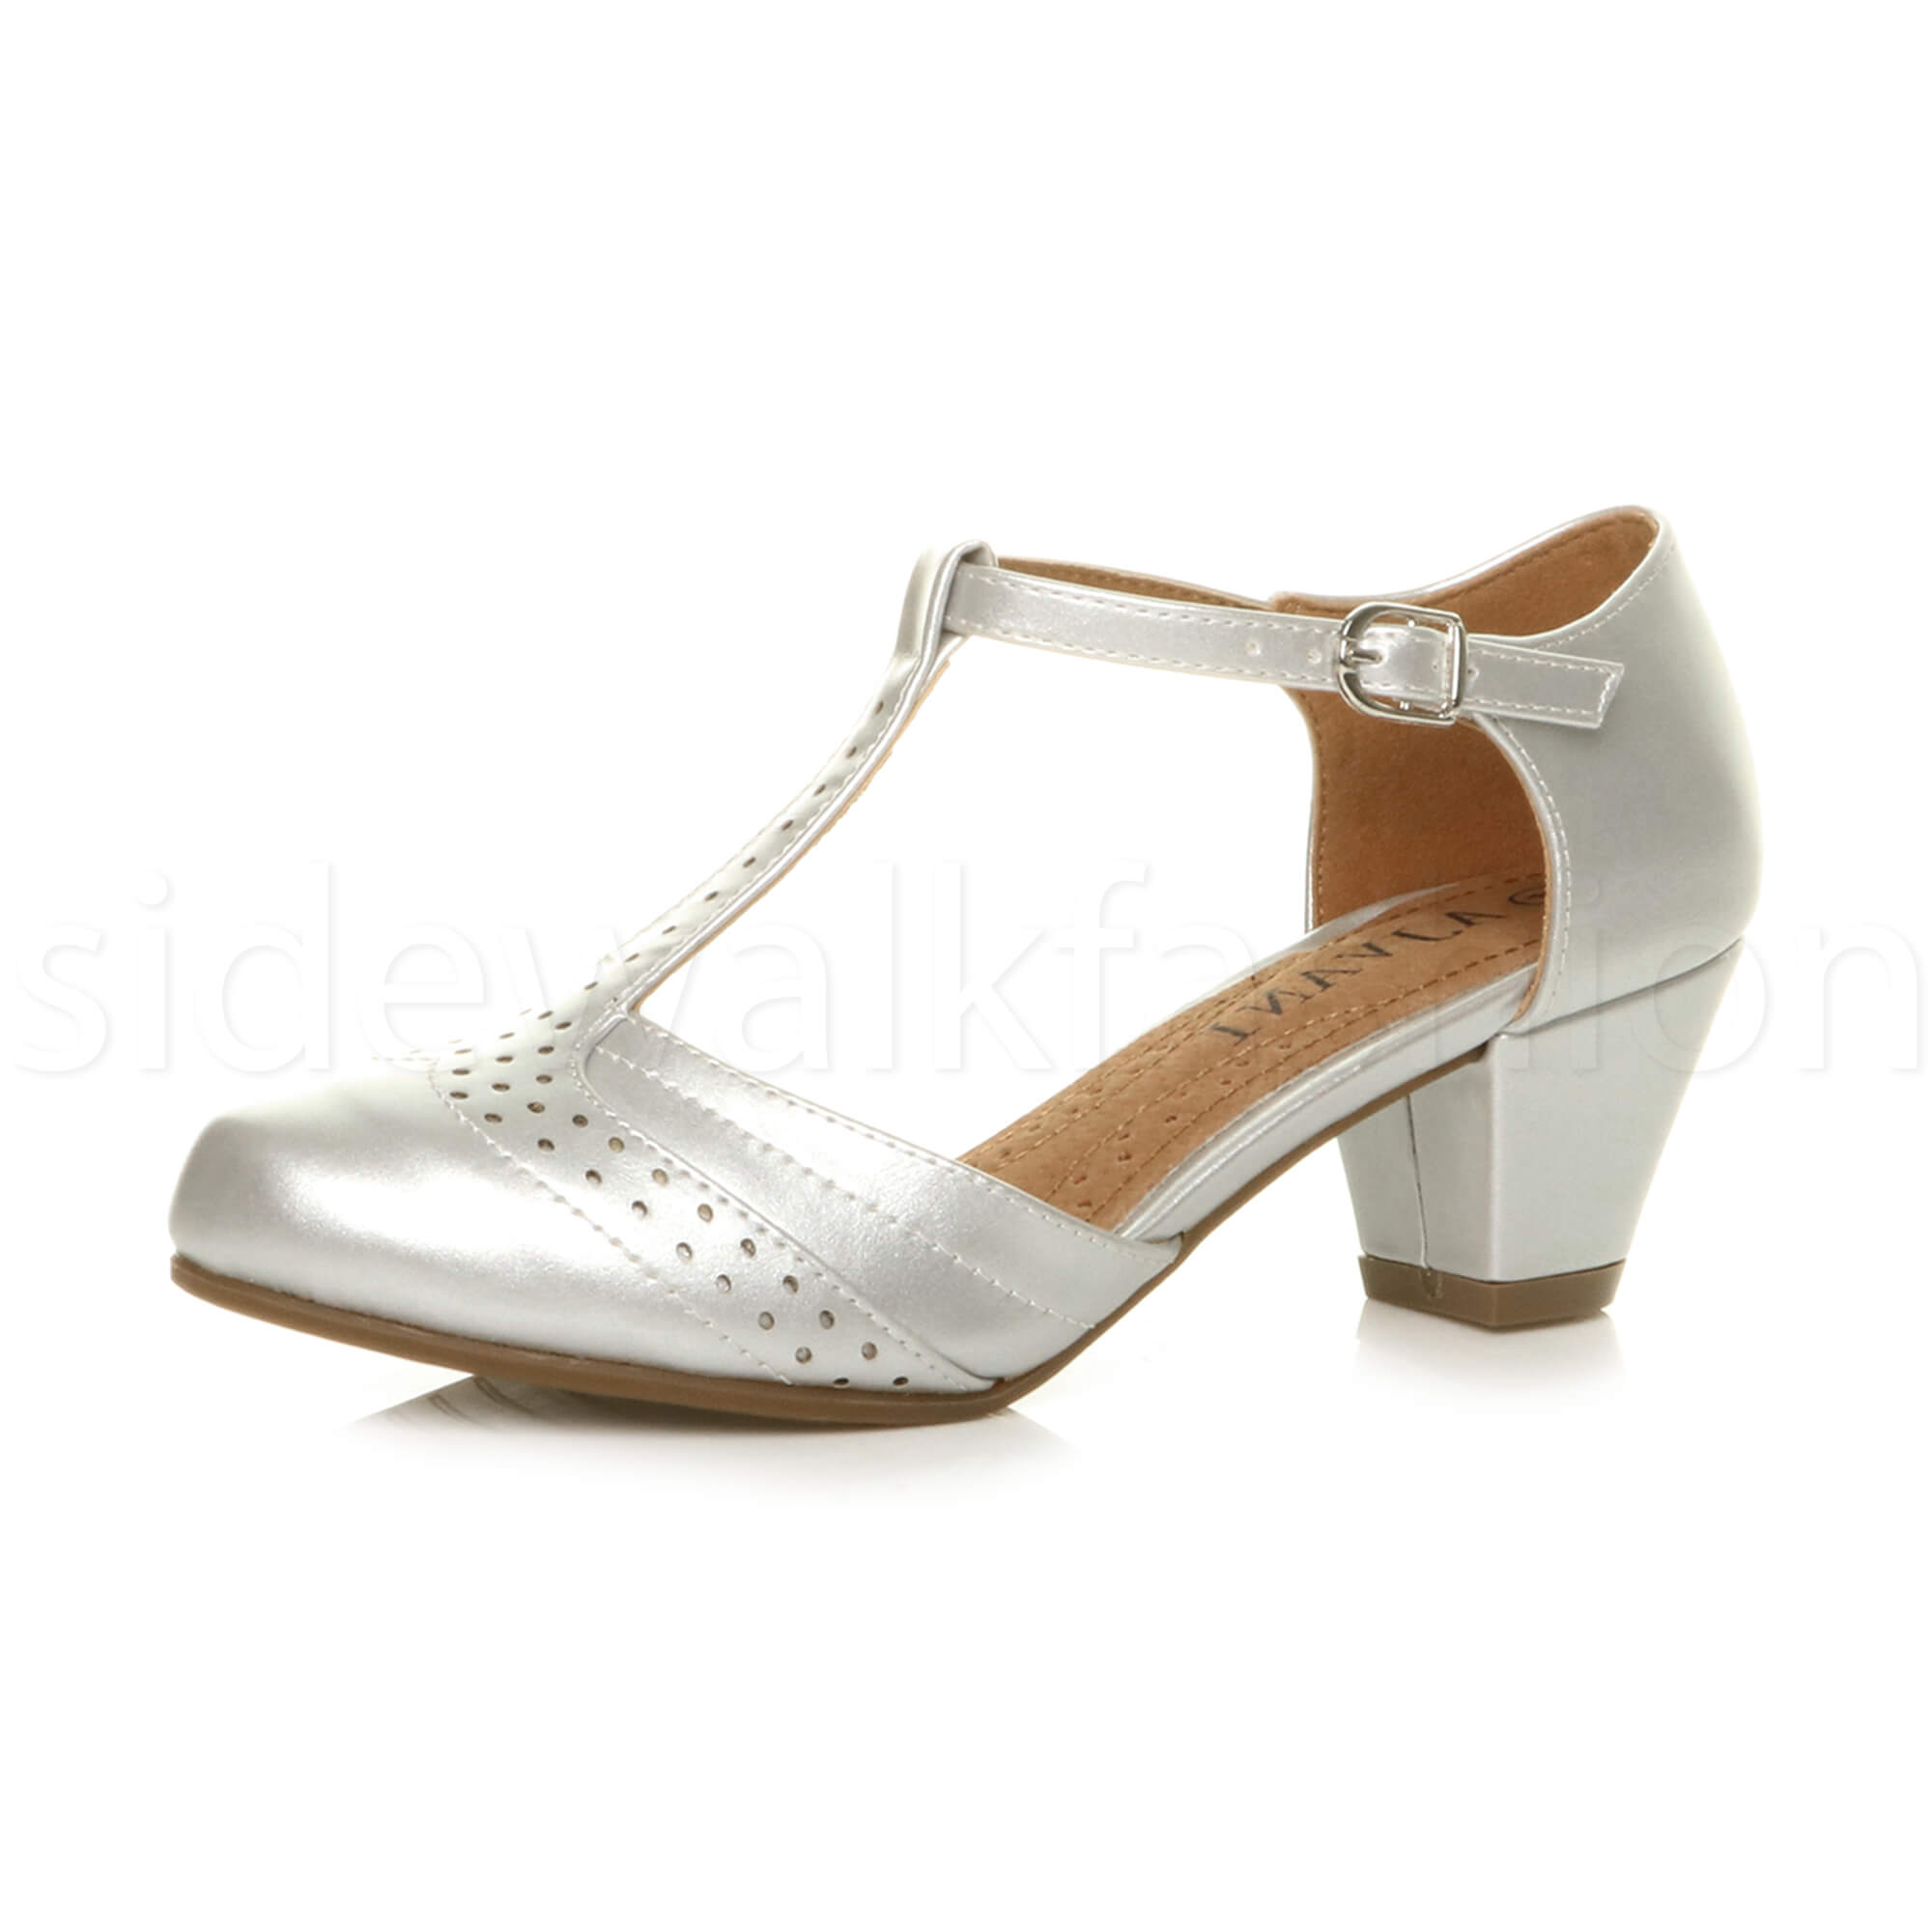 Womens Ladies Low Mid High Heel Block Mary Jane Smart Work Shoe Size 3 4 5 6 7 8